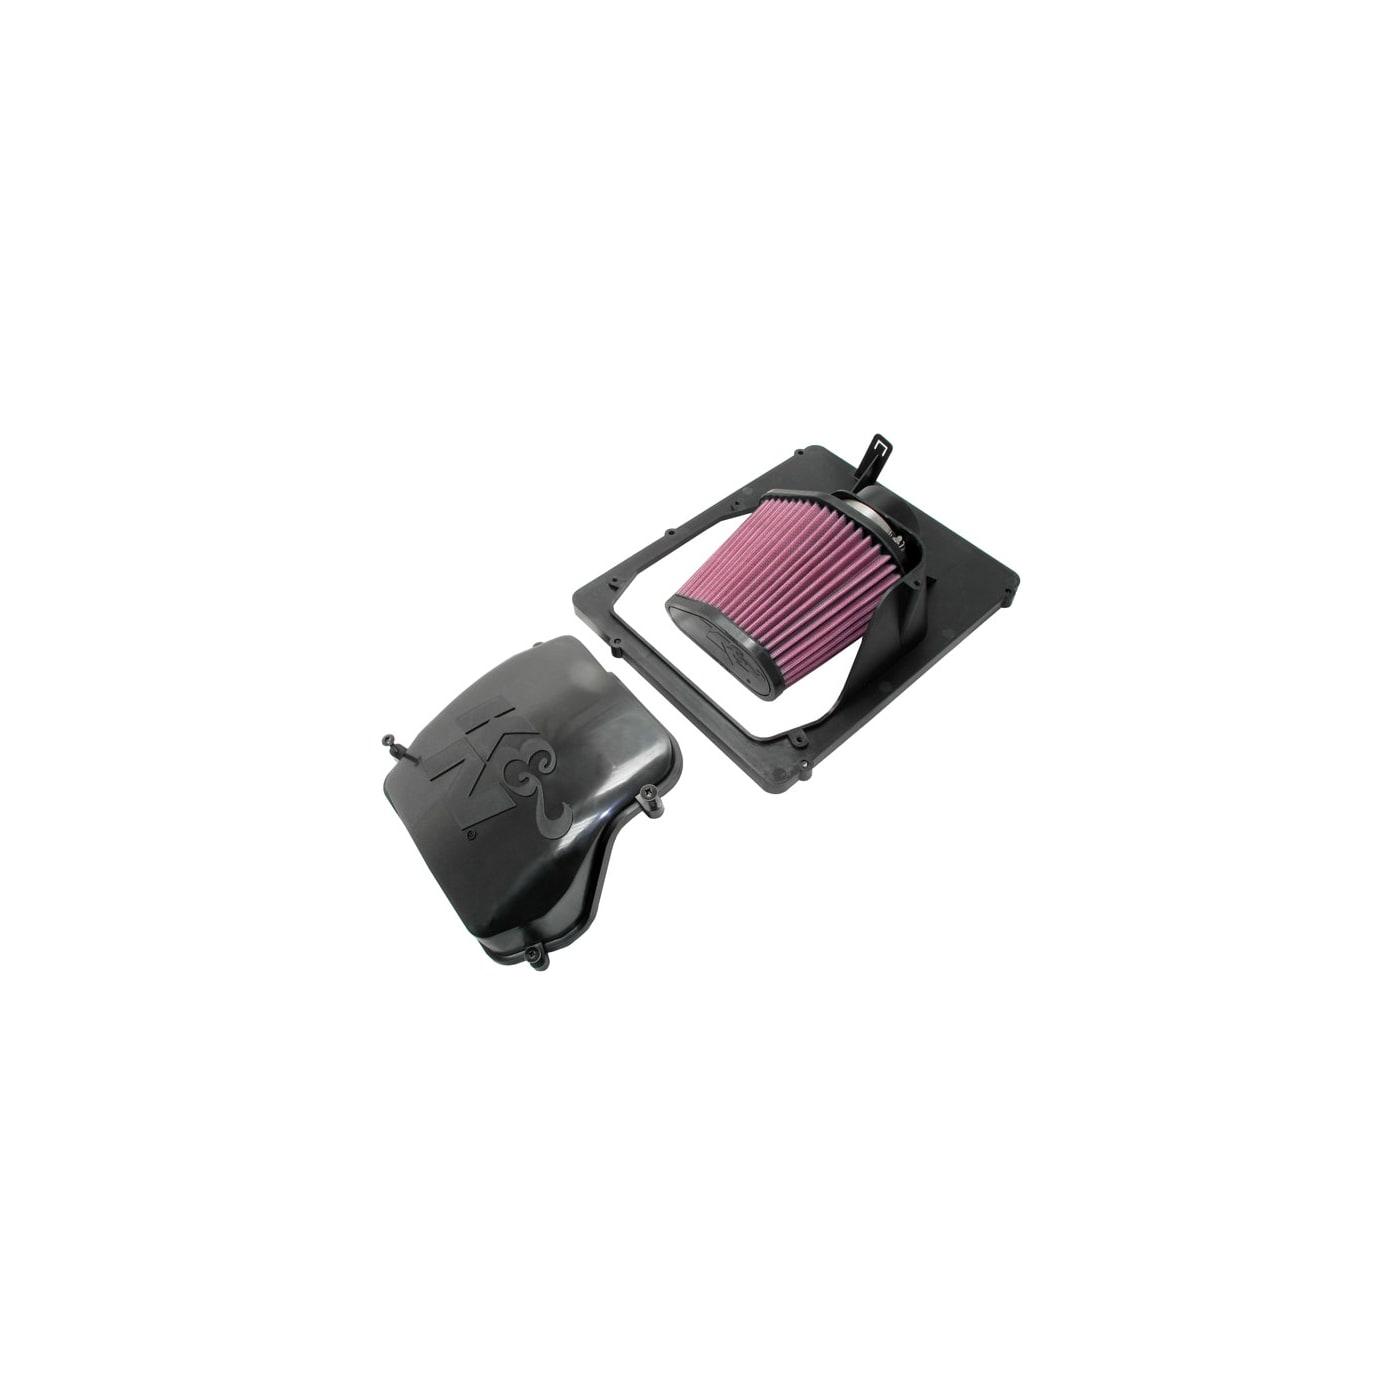 K/&N Filters E-4900 Hi-Flow Air Intake Filter